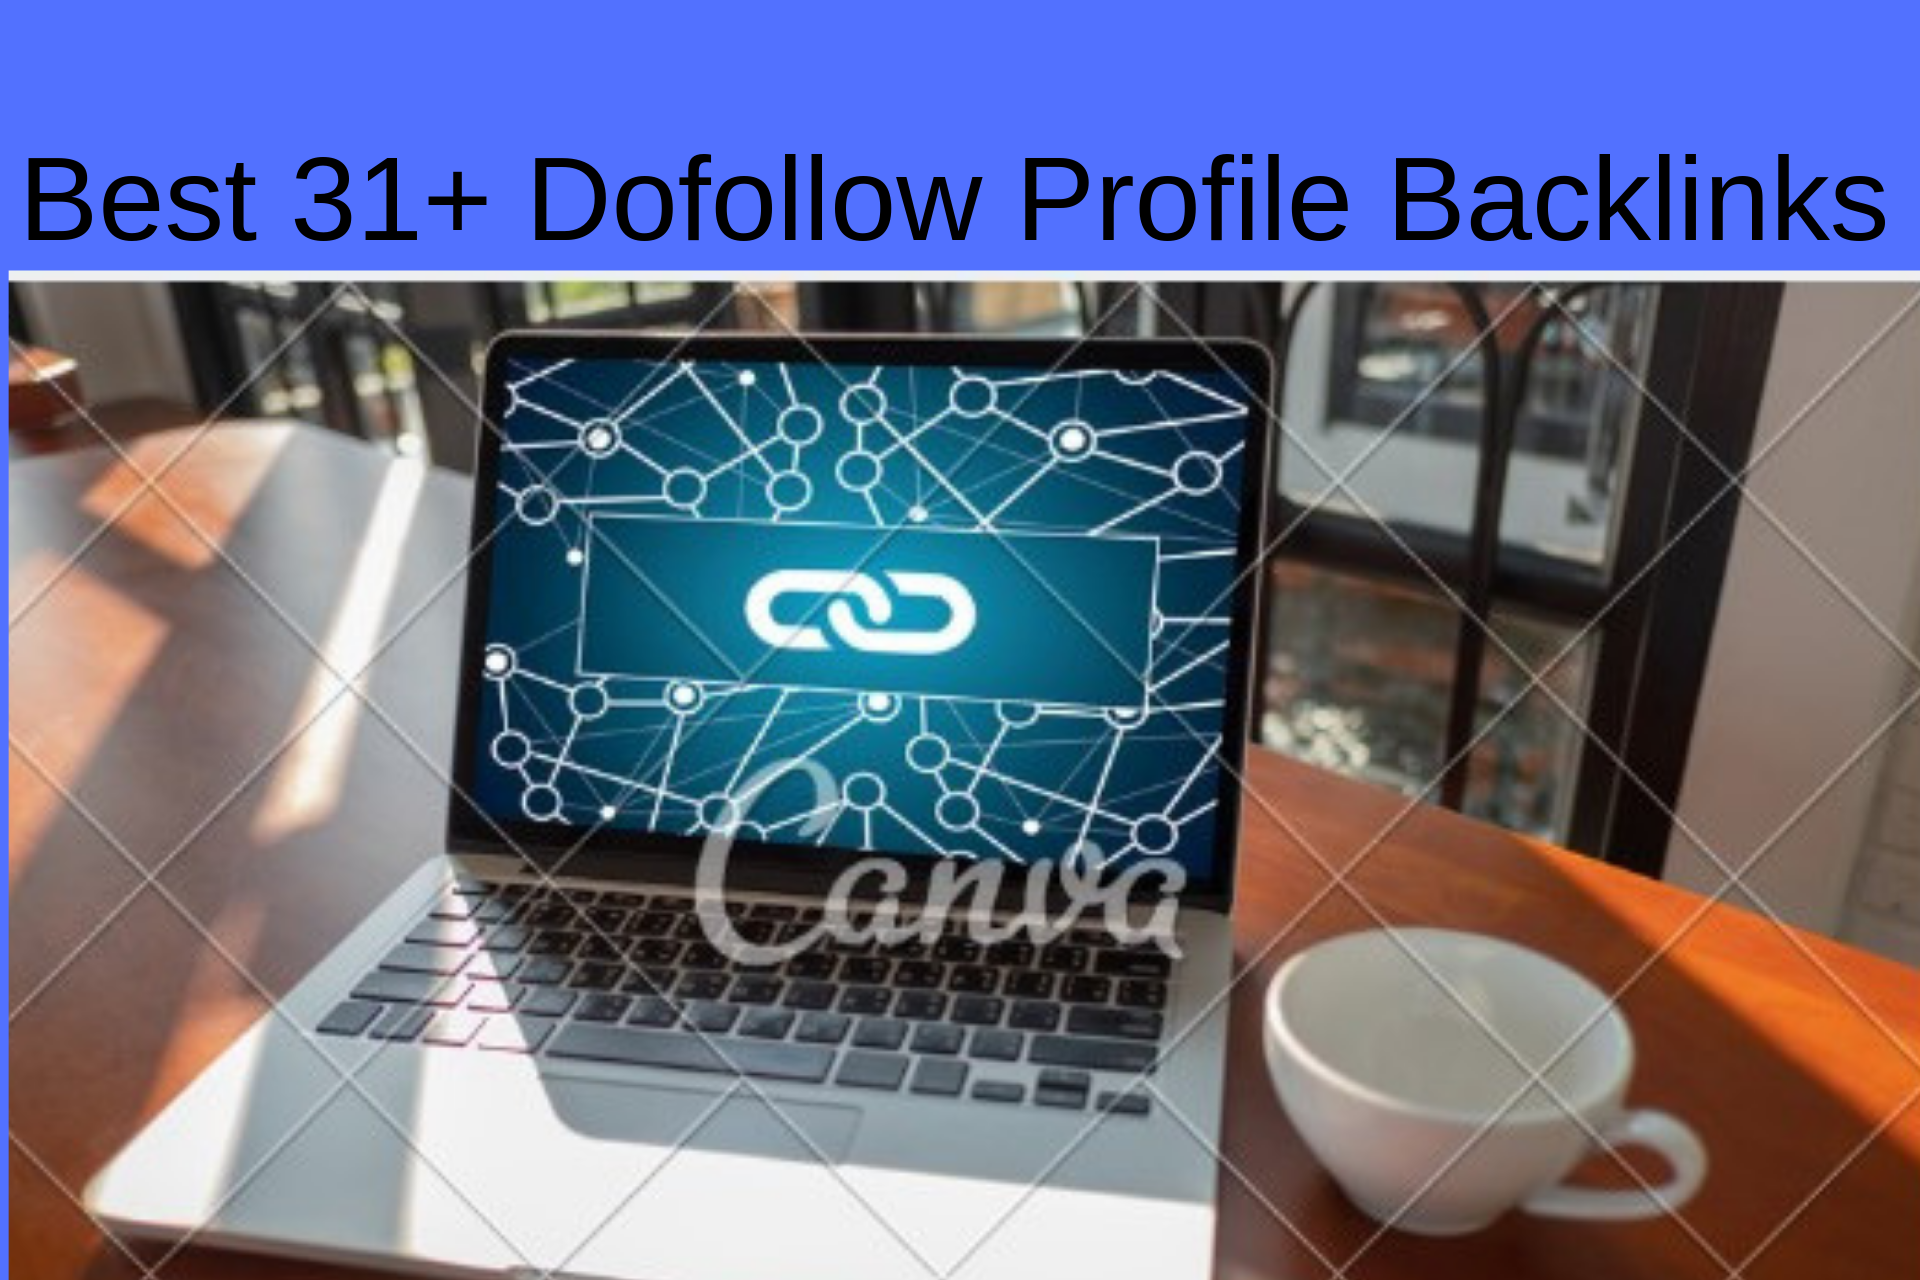 Best 31+ Dofollow Profile Backlinks to increase ranking for seoclerk